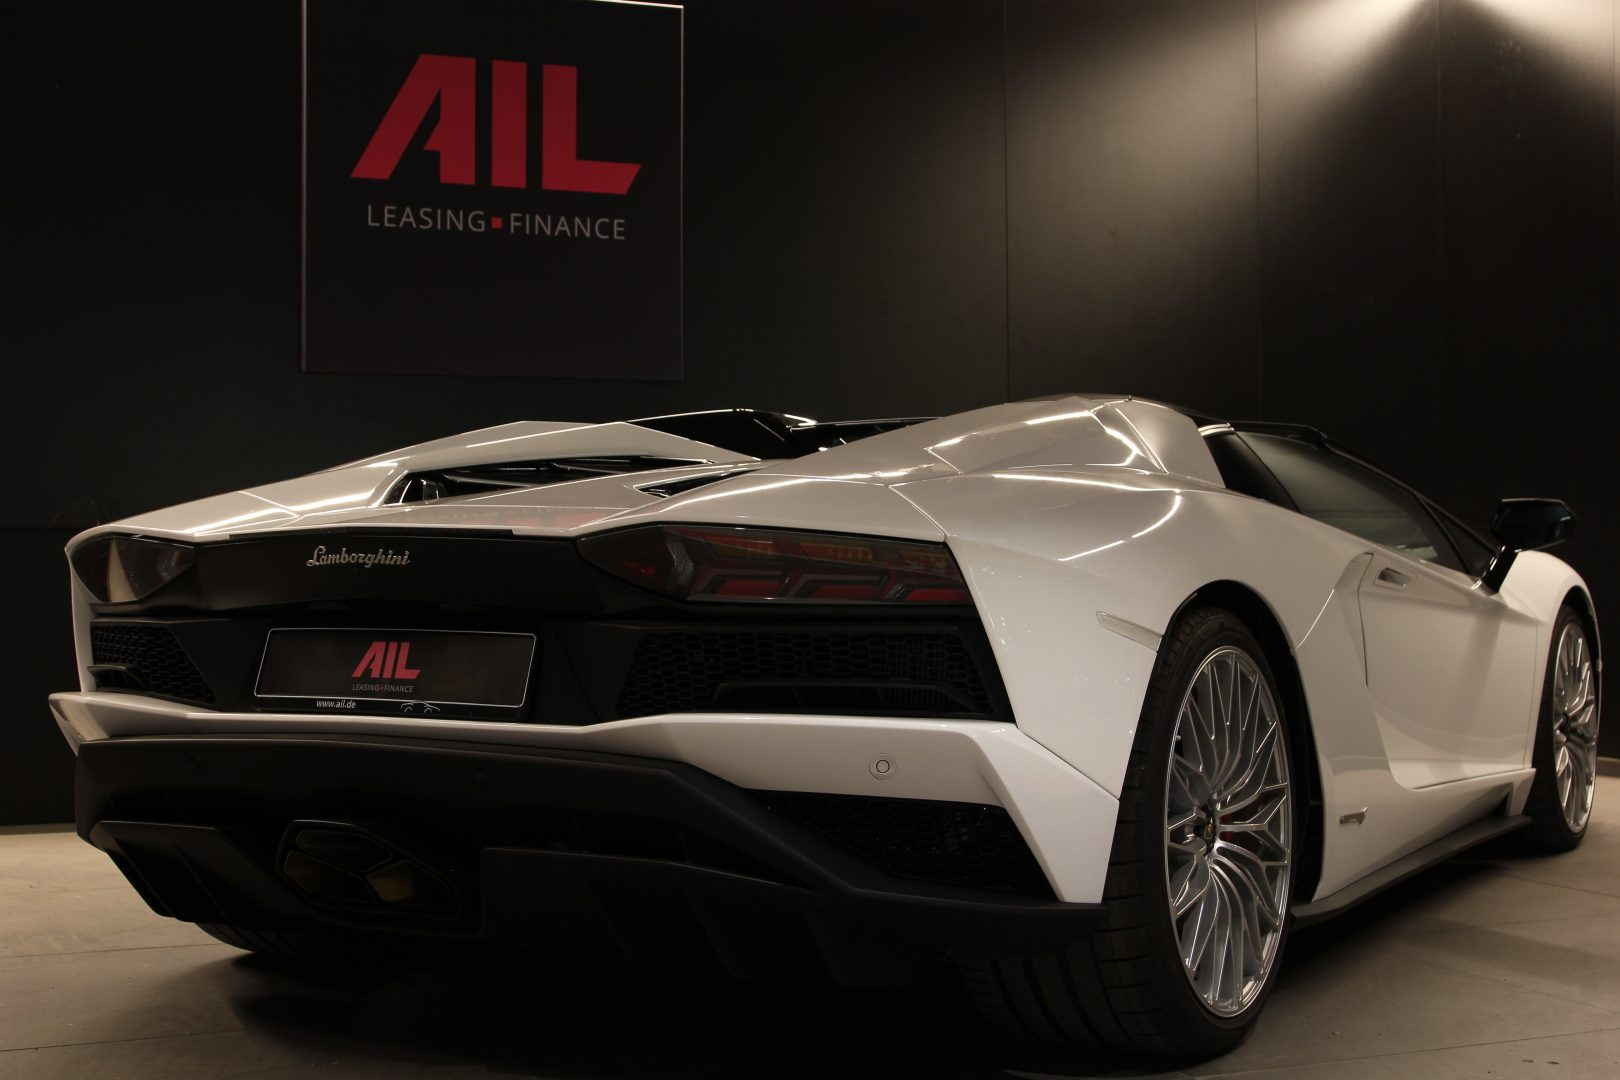 AIL Lamborghini Aventador S Roadster 16